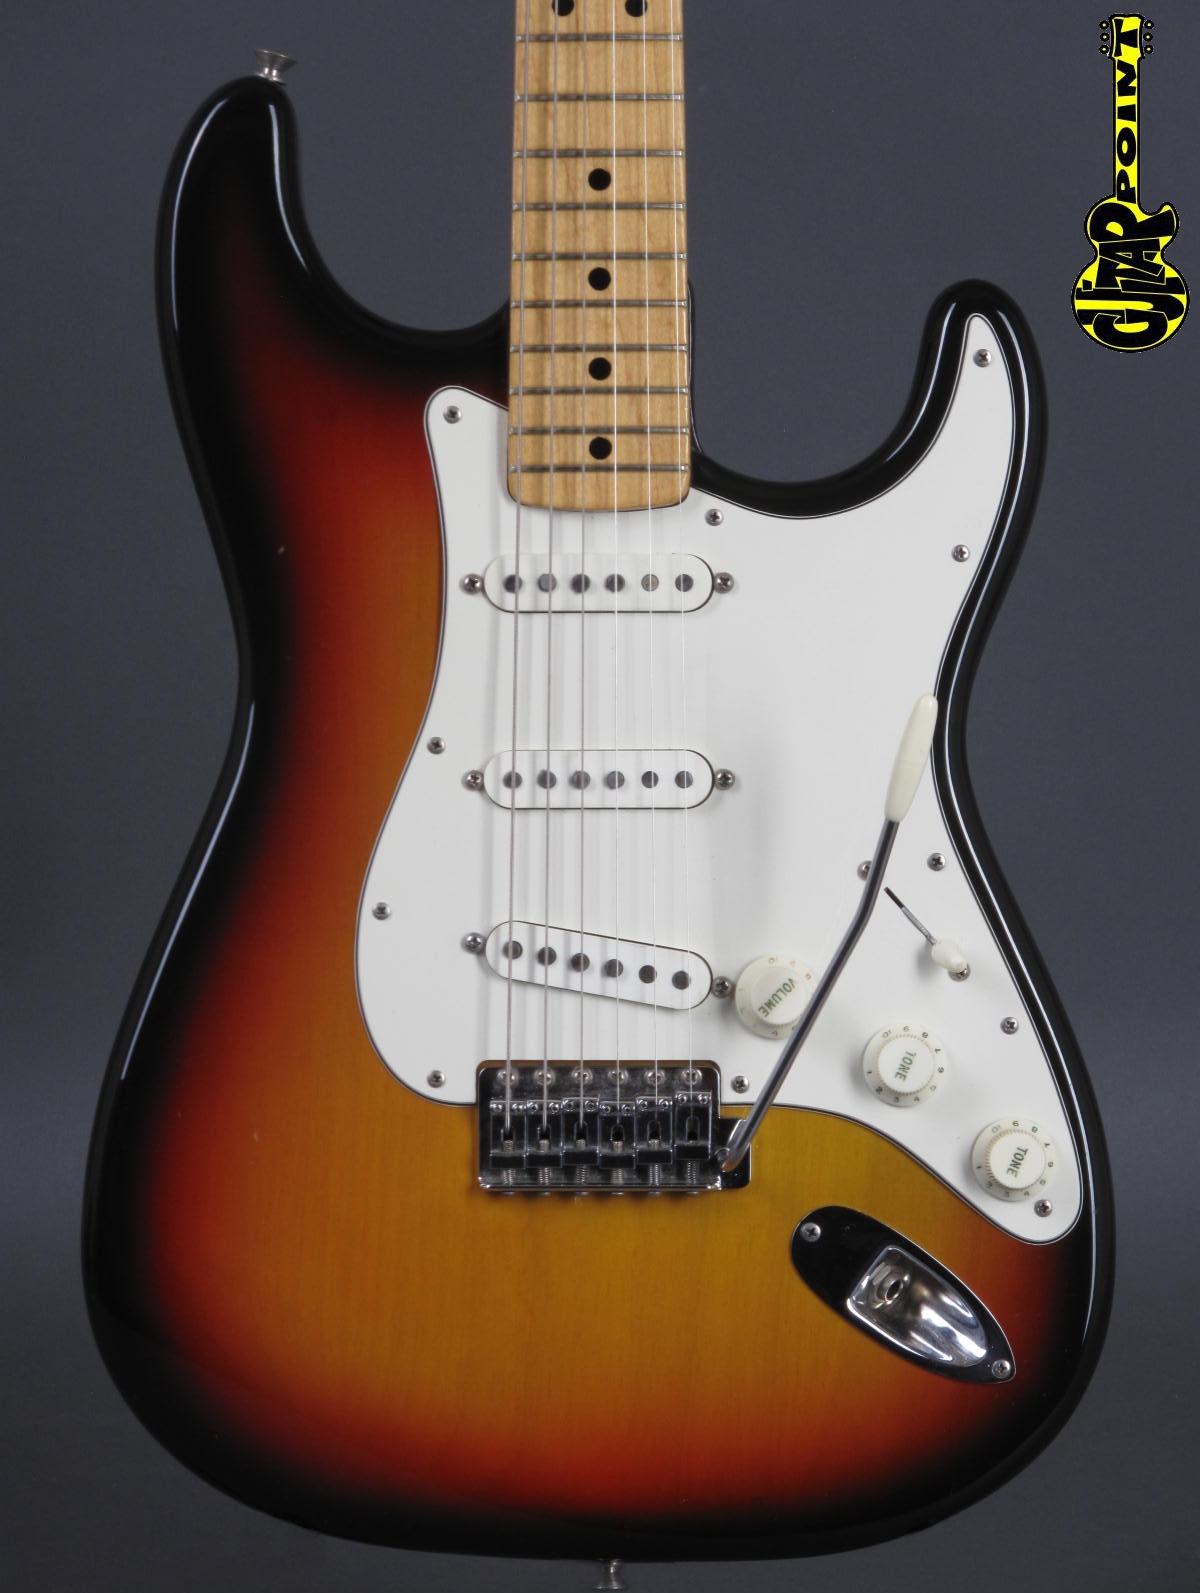 1973 Fender Stratocaster - 3t-Sunburst incl. blk Tolex case